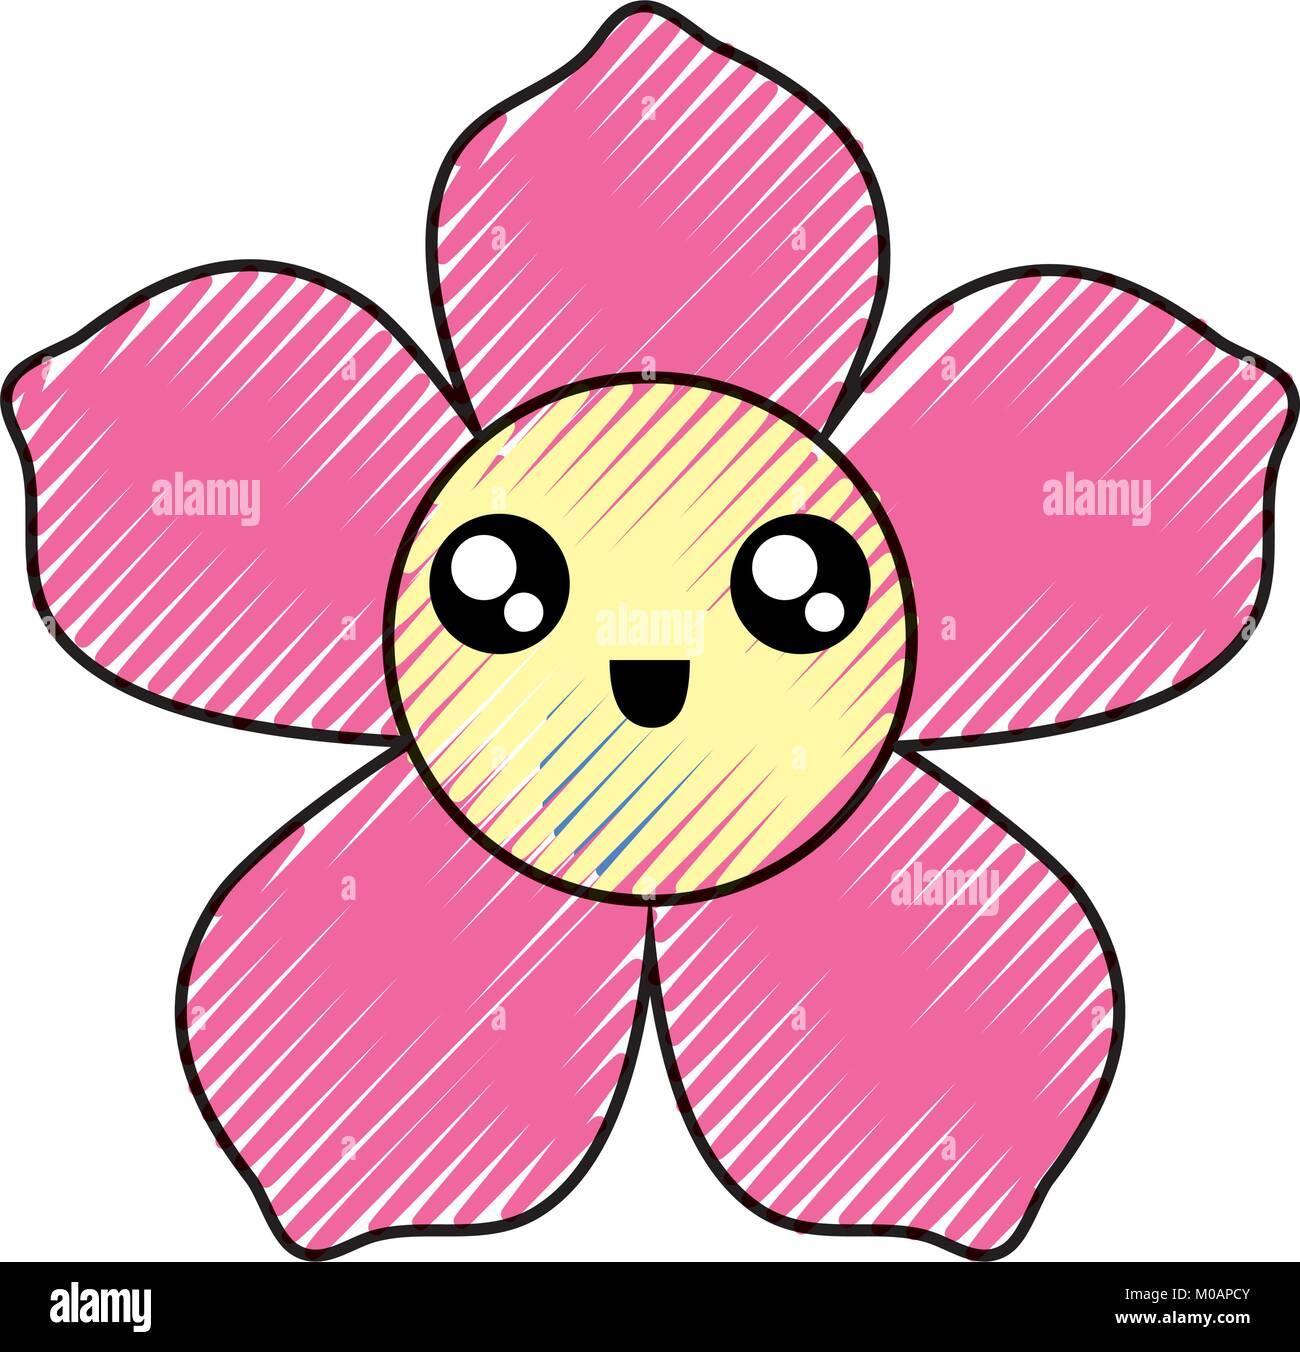 Tropical flower icon stock photos tropical flower icon stock kawaii tropical flower icon stock image mightylinksfo